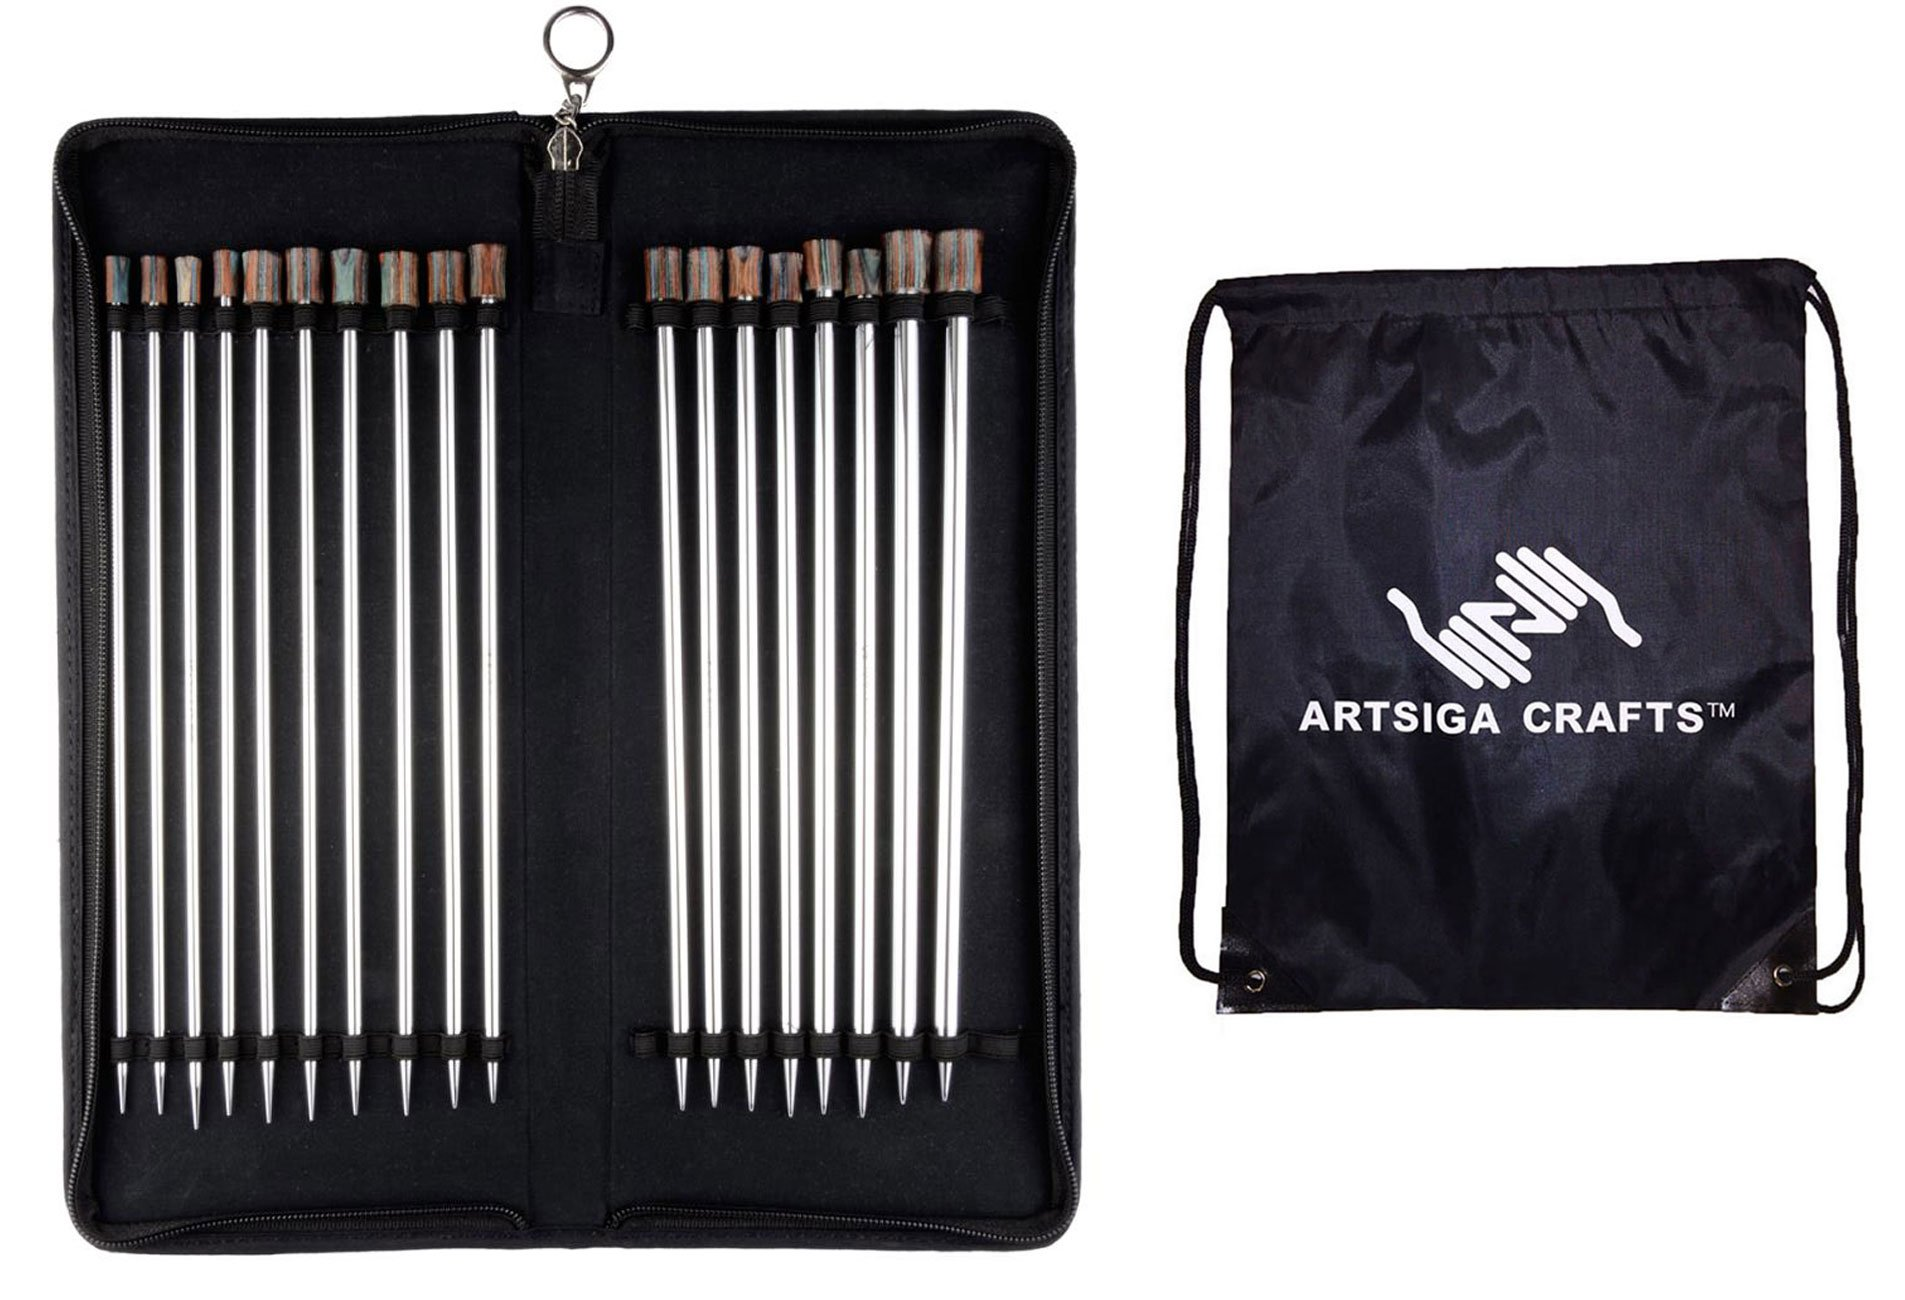 Knitter's Pride Knitting Needles Nova Platina 14 inch (35cm) Single Pointed Set Bundle with 1 Artsiga Crafts Project Bag 120608